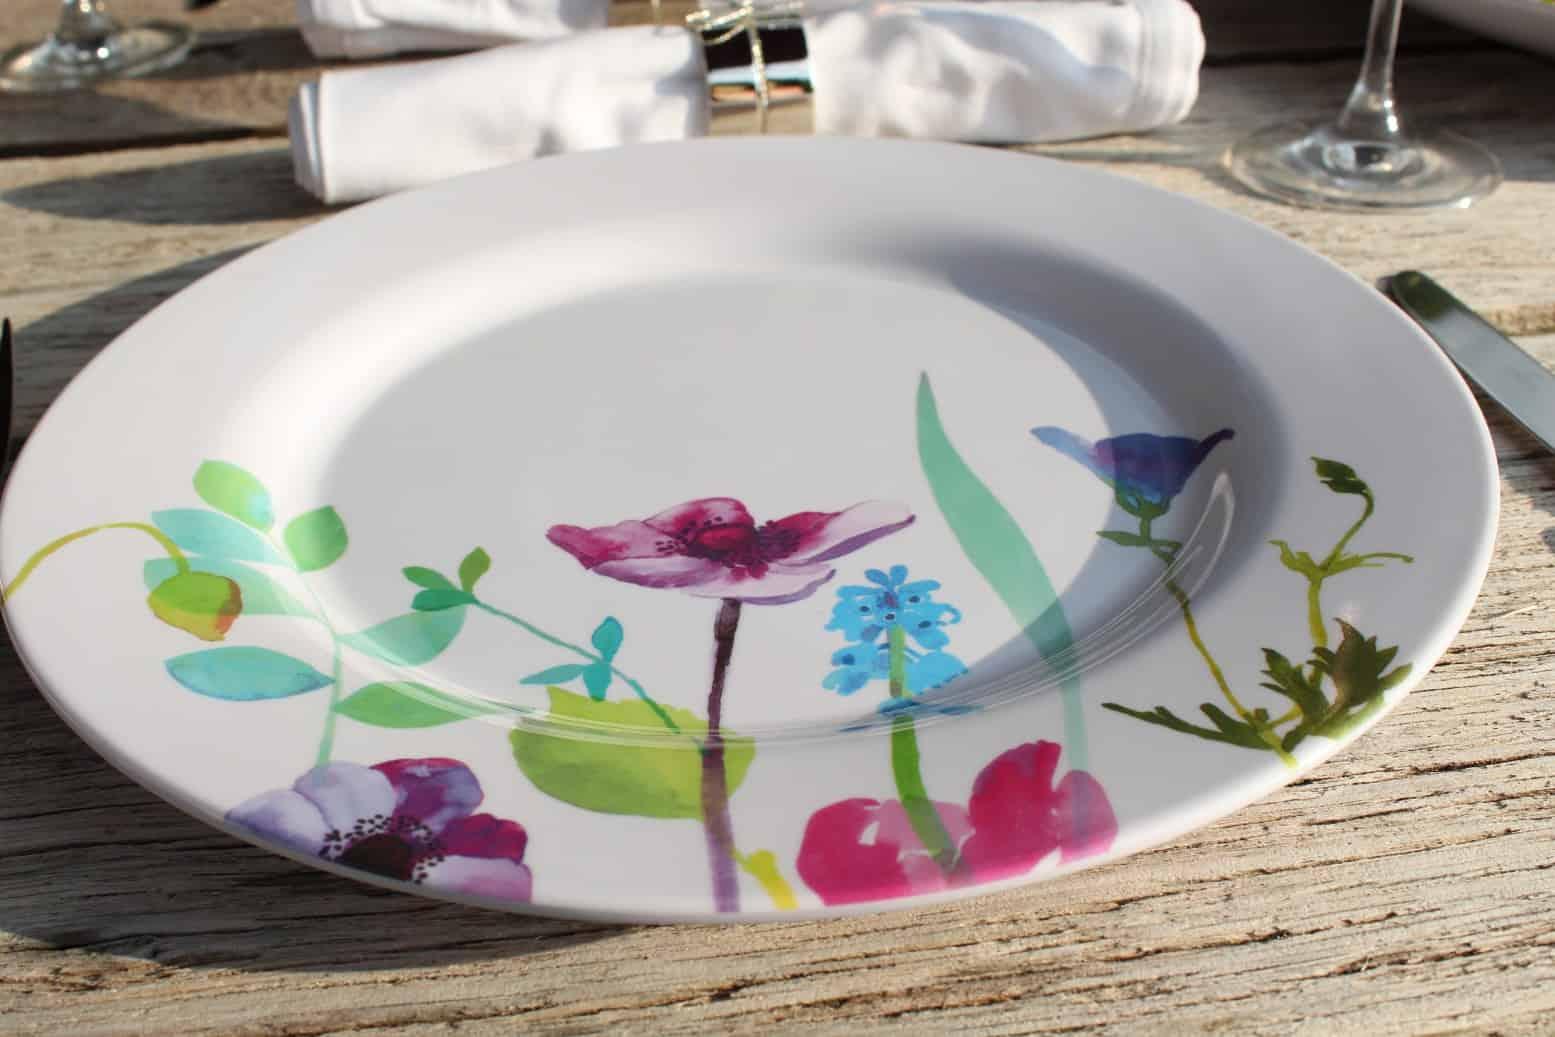 Portmeirion Water Garden Melamine Outdoor Tableware Review